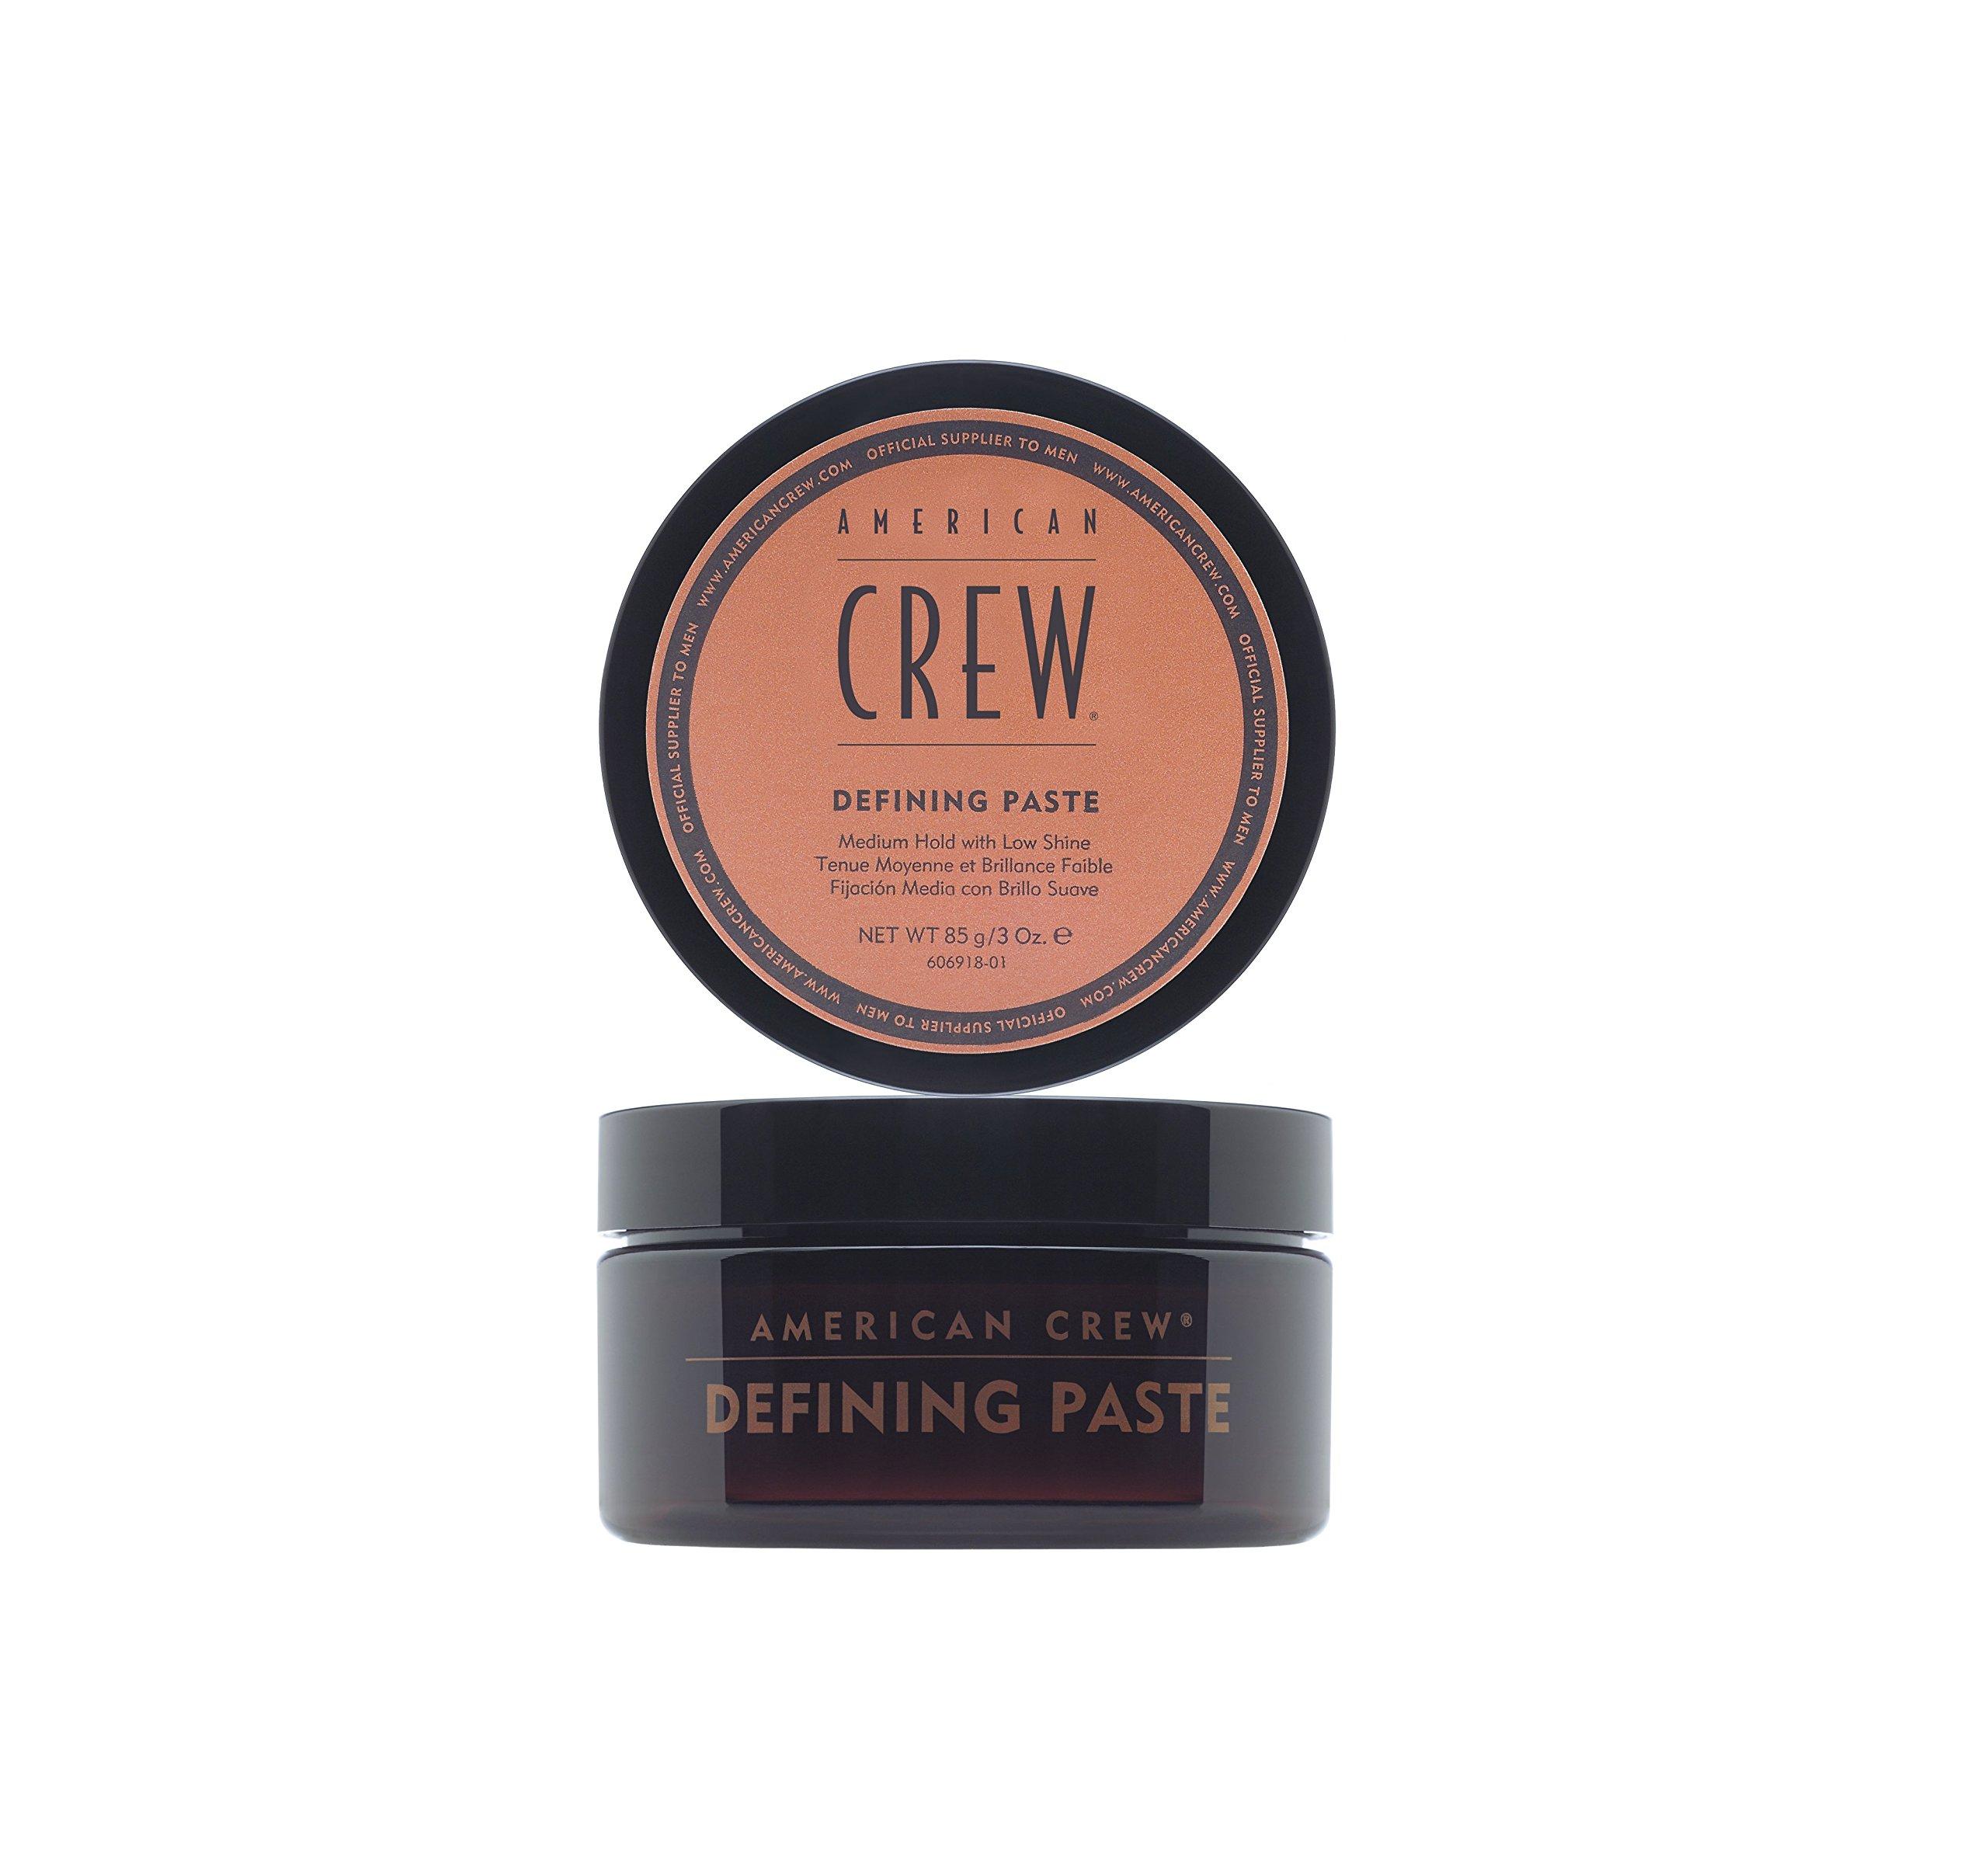 American Crew Defining Paste 3oz/85g